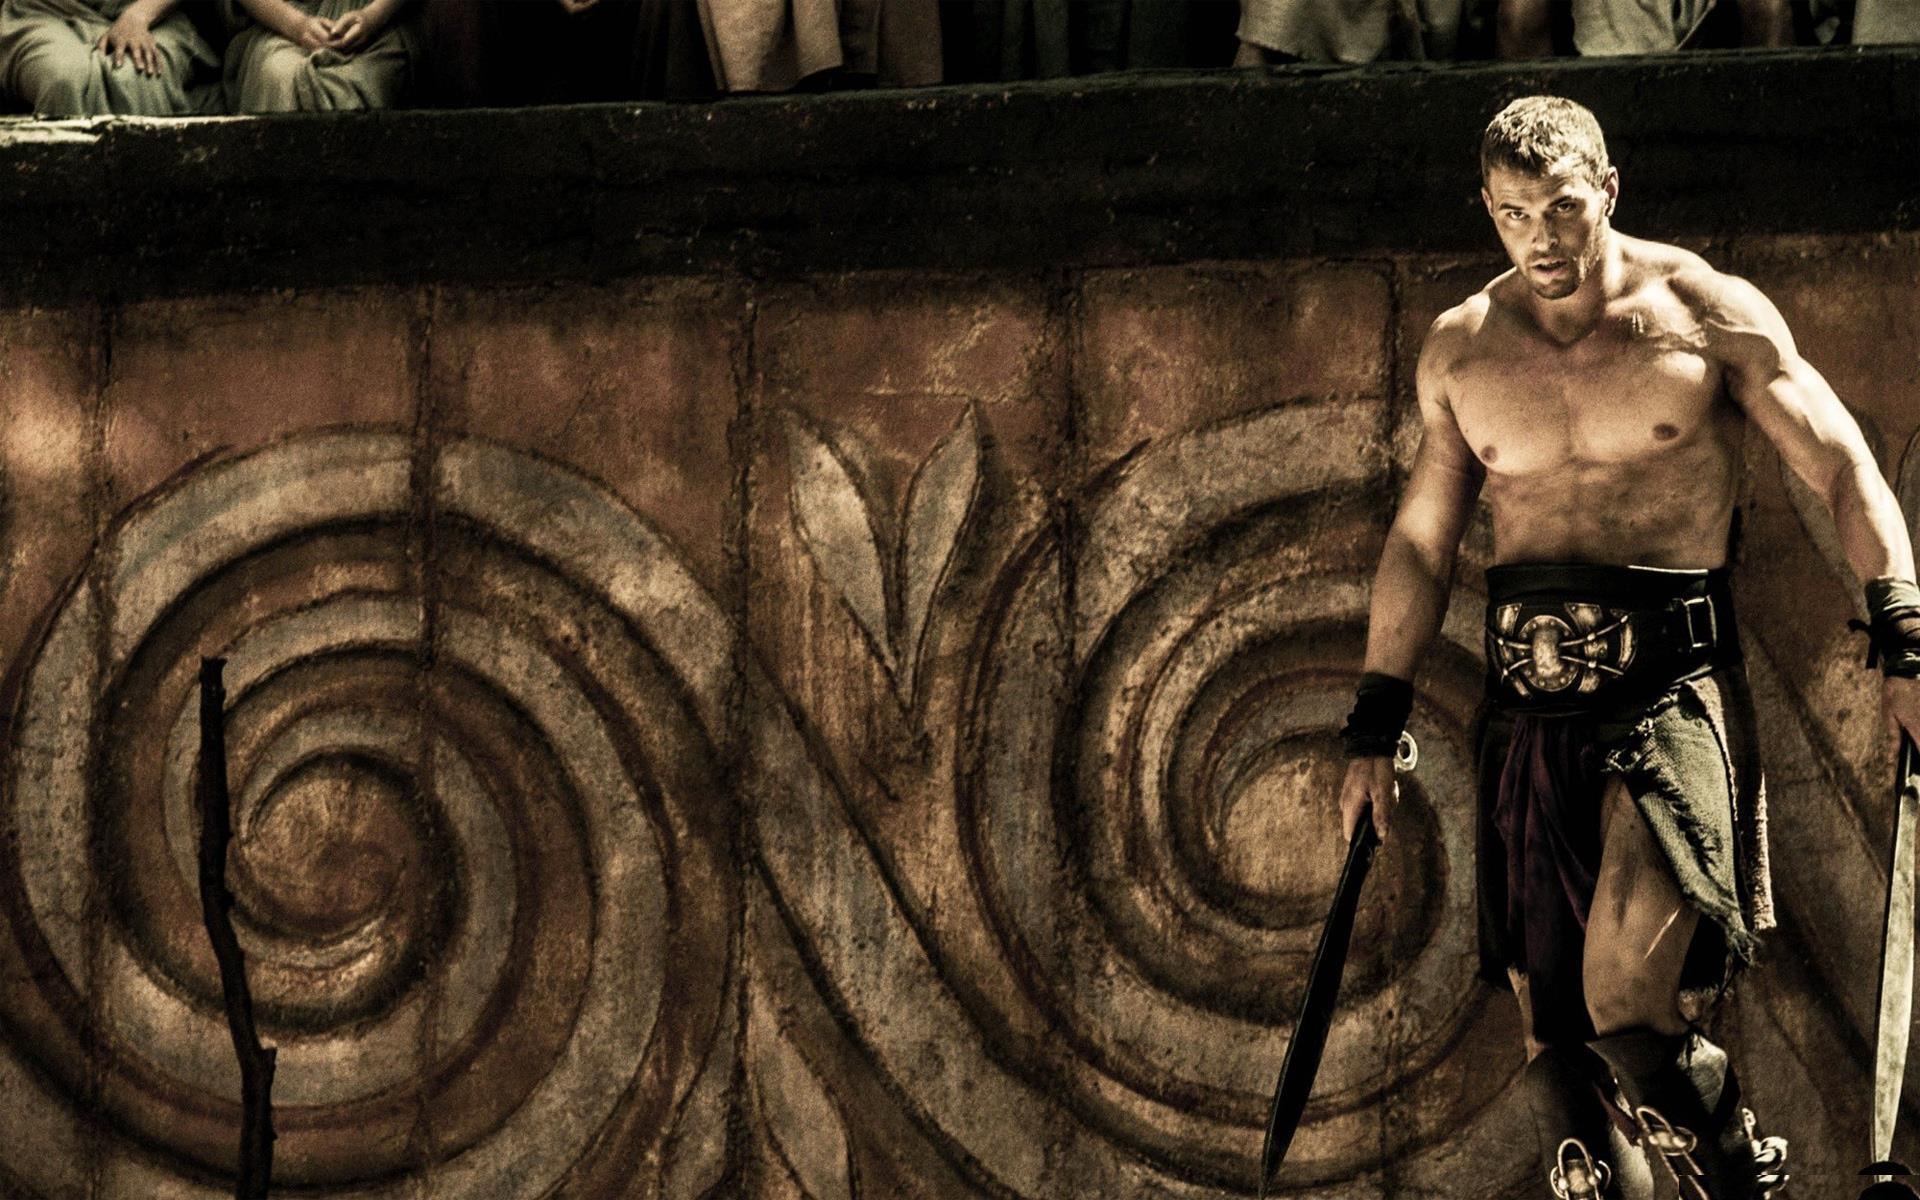 Hercules Cover Movies Wallpaper Desktop 281 #4242 Wallpaper | High ...